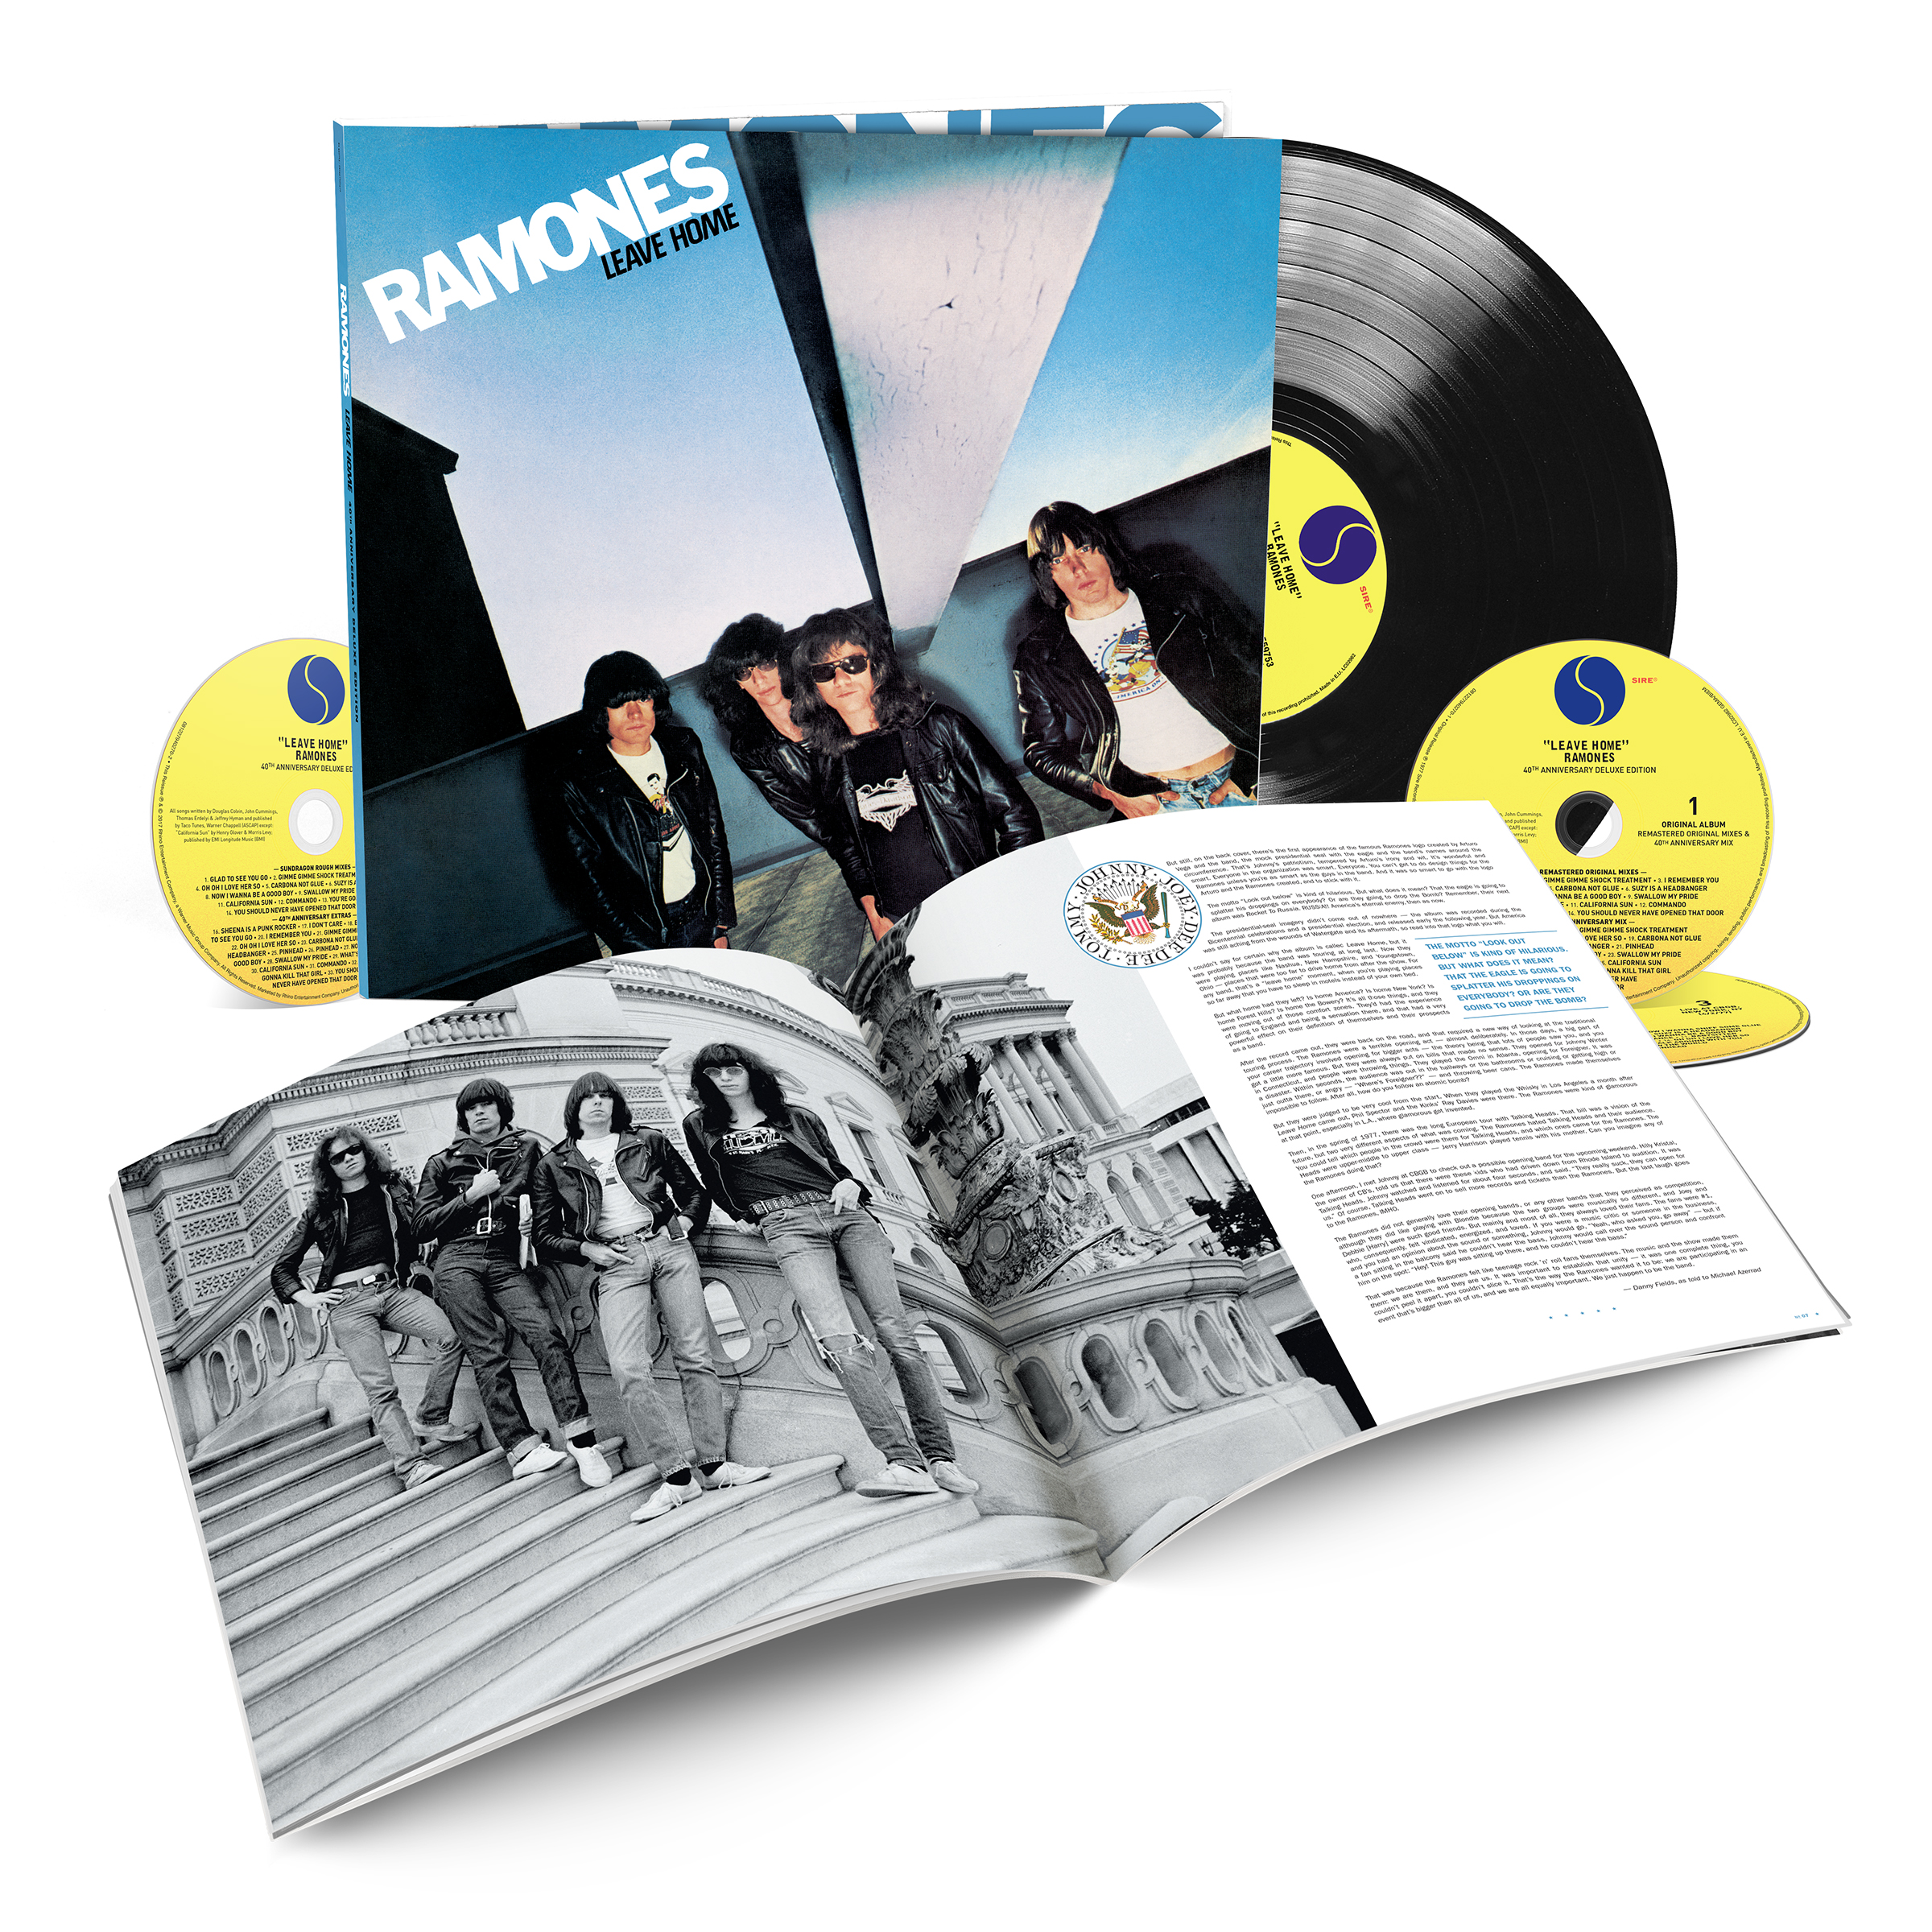 Leave Home 40th Anniversary Deluxe Edition Rhino Media